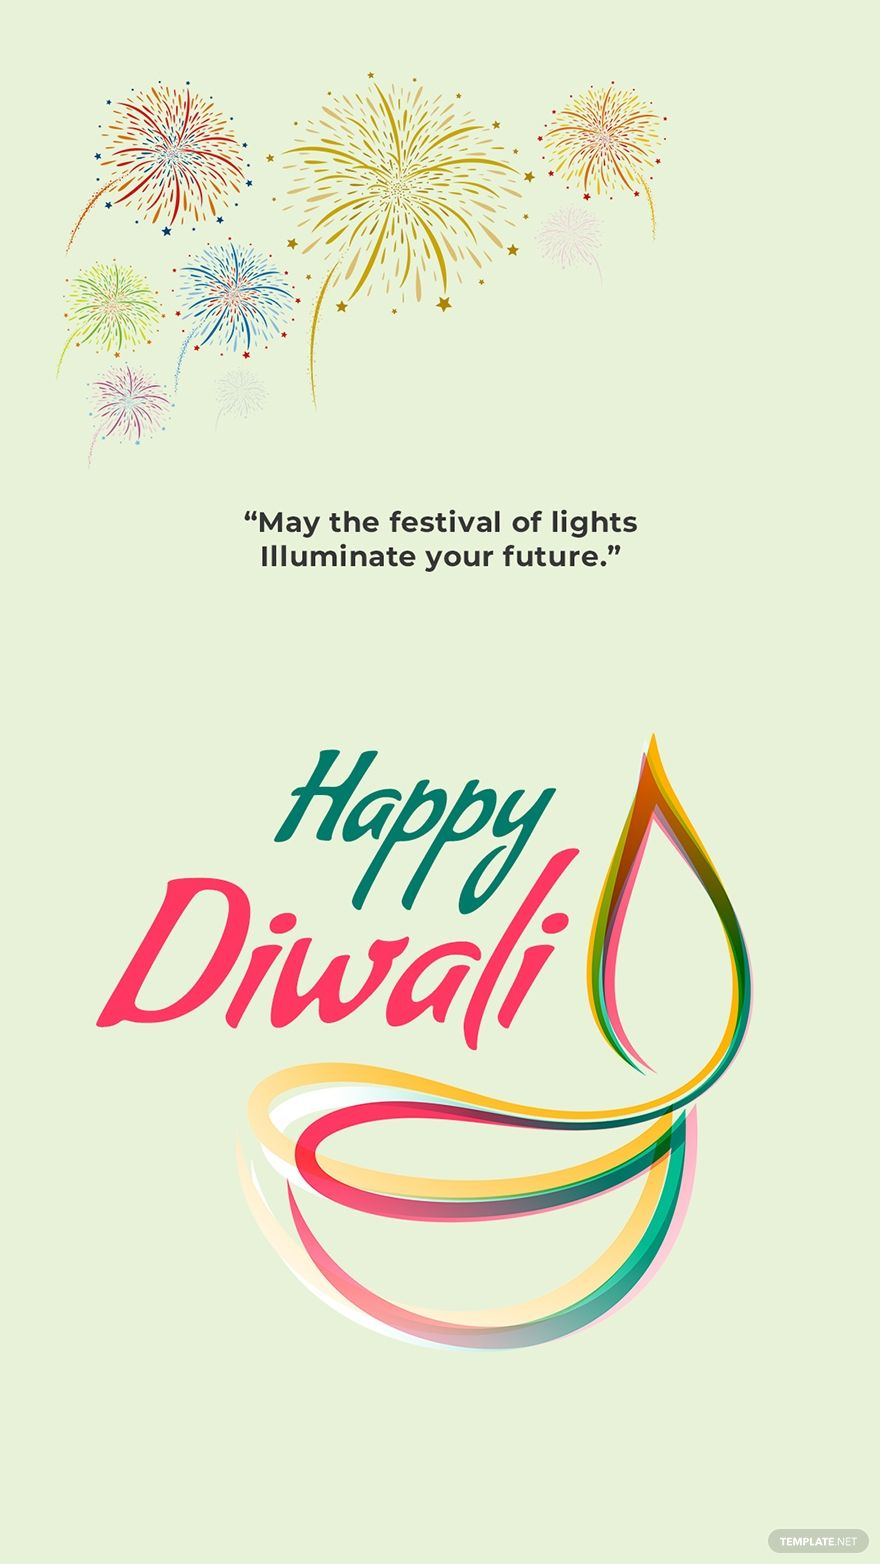 Free Happy Diwali Instagram Story Template #AD, , #Sponsored, #Diwali, #Happy, #Free, #Template, #Story